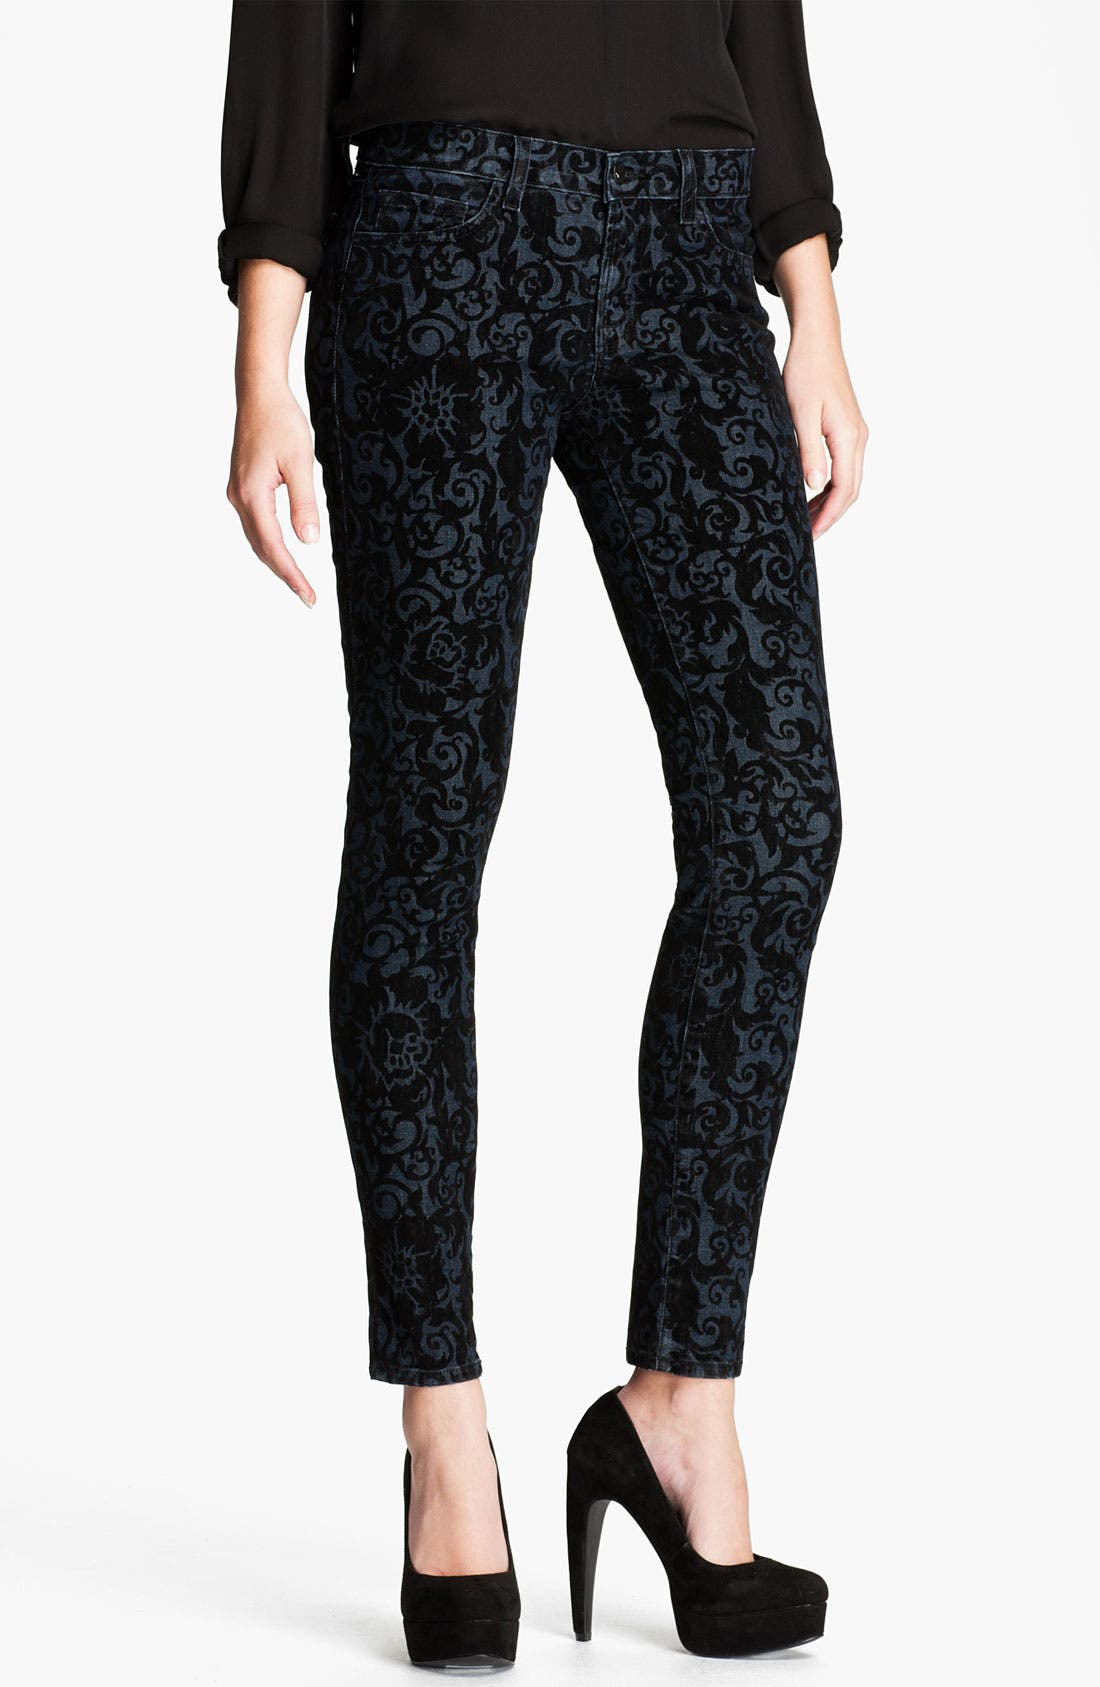 Main Image - J Brand Brocade Print Stretch Denim Skinny Jeans